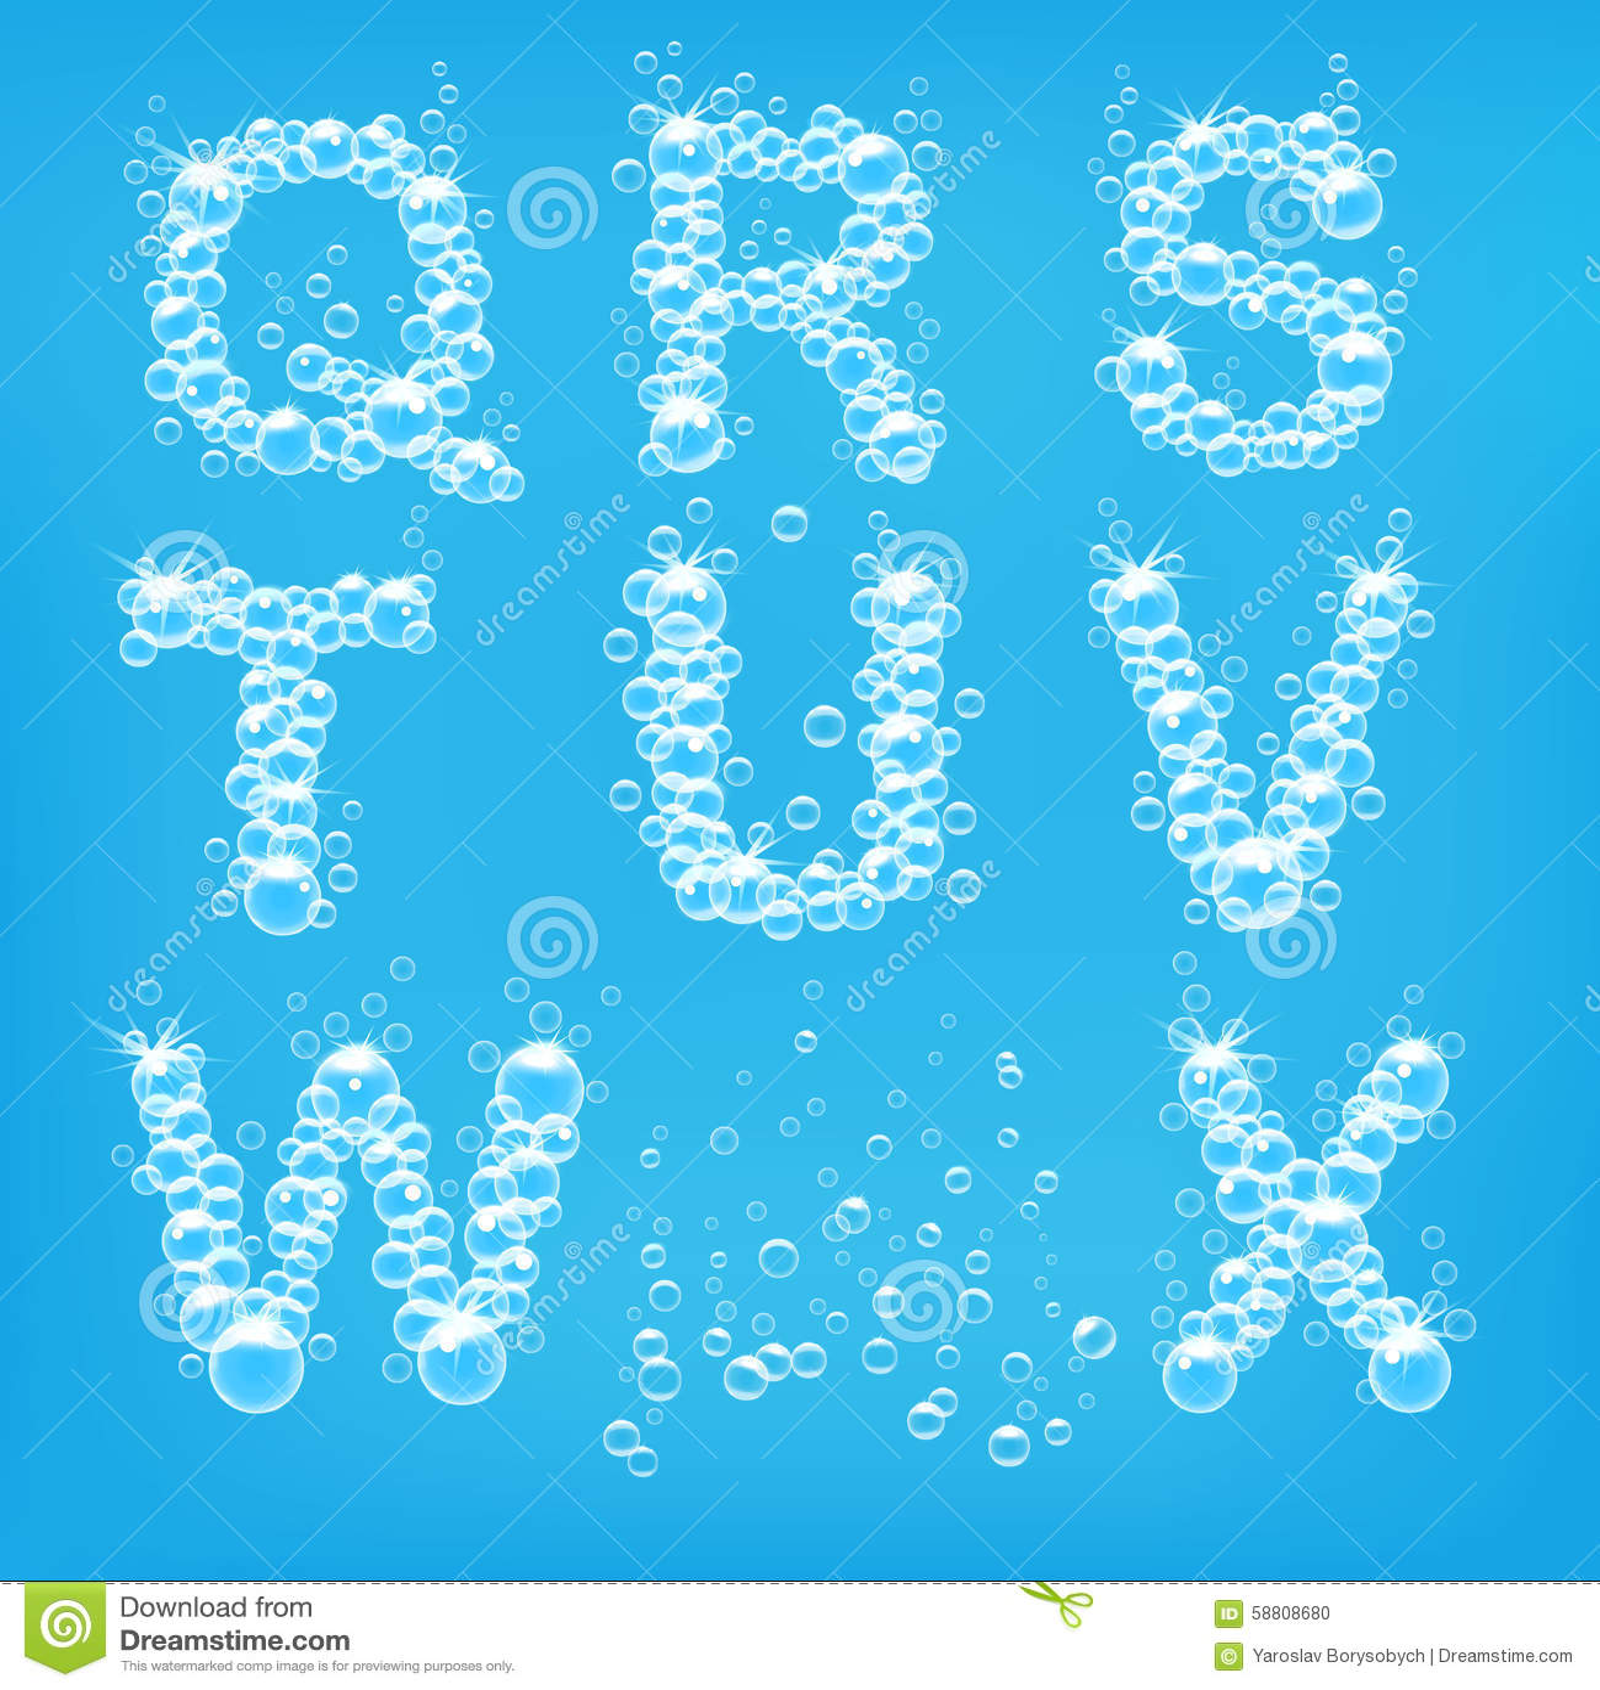 Alphabet Of Soap Bubbles Vector Stock Vector